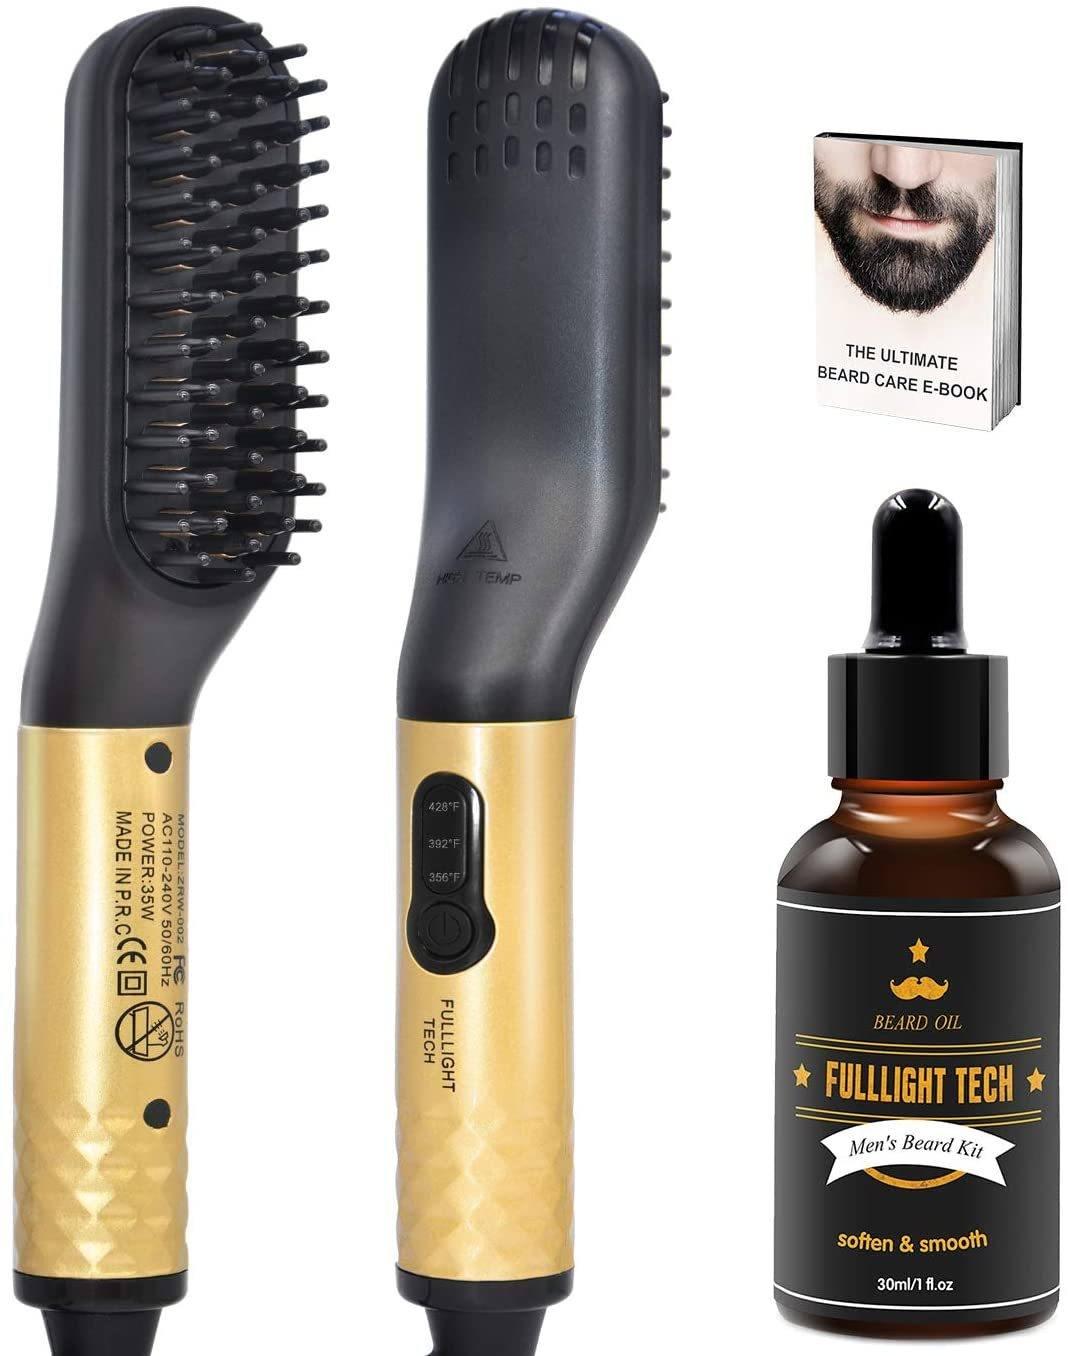 lisseur barbe Fulllight Tech